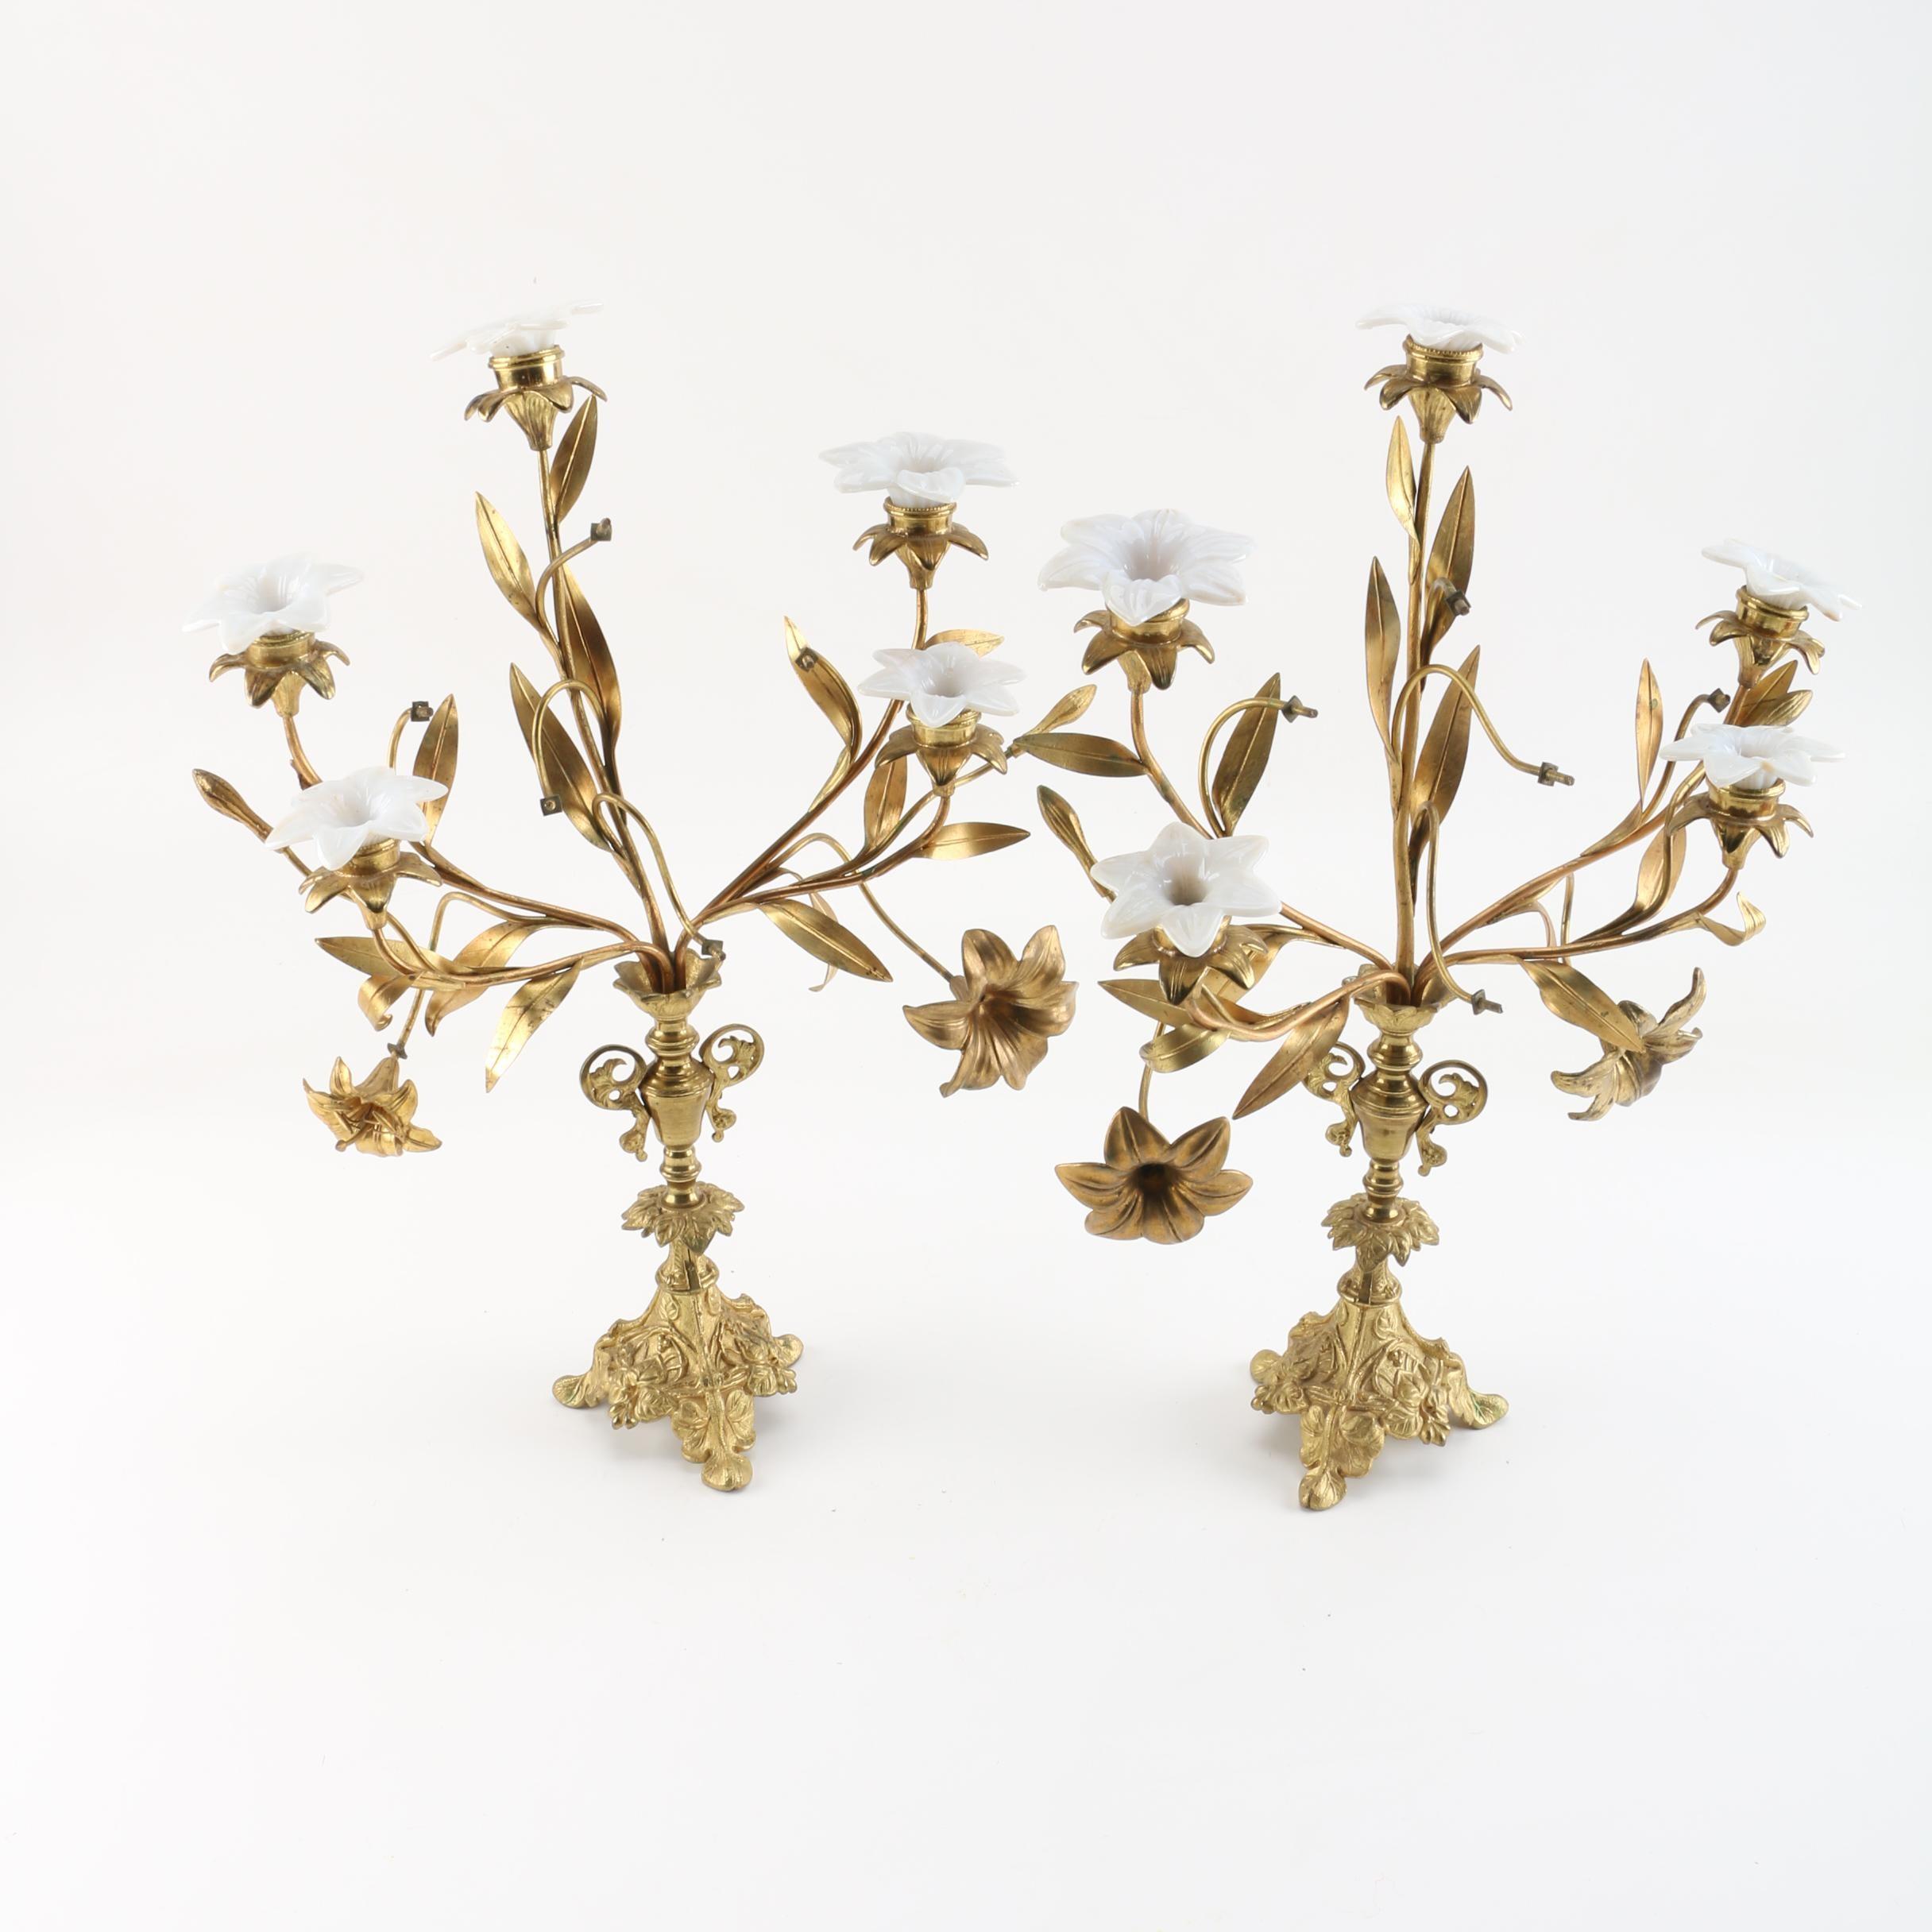 Art Nouveau Brass and Porcelain Candelabra